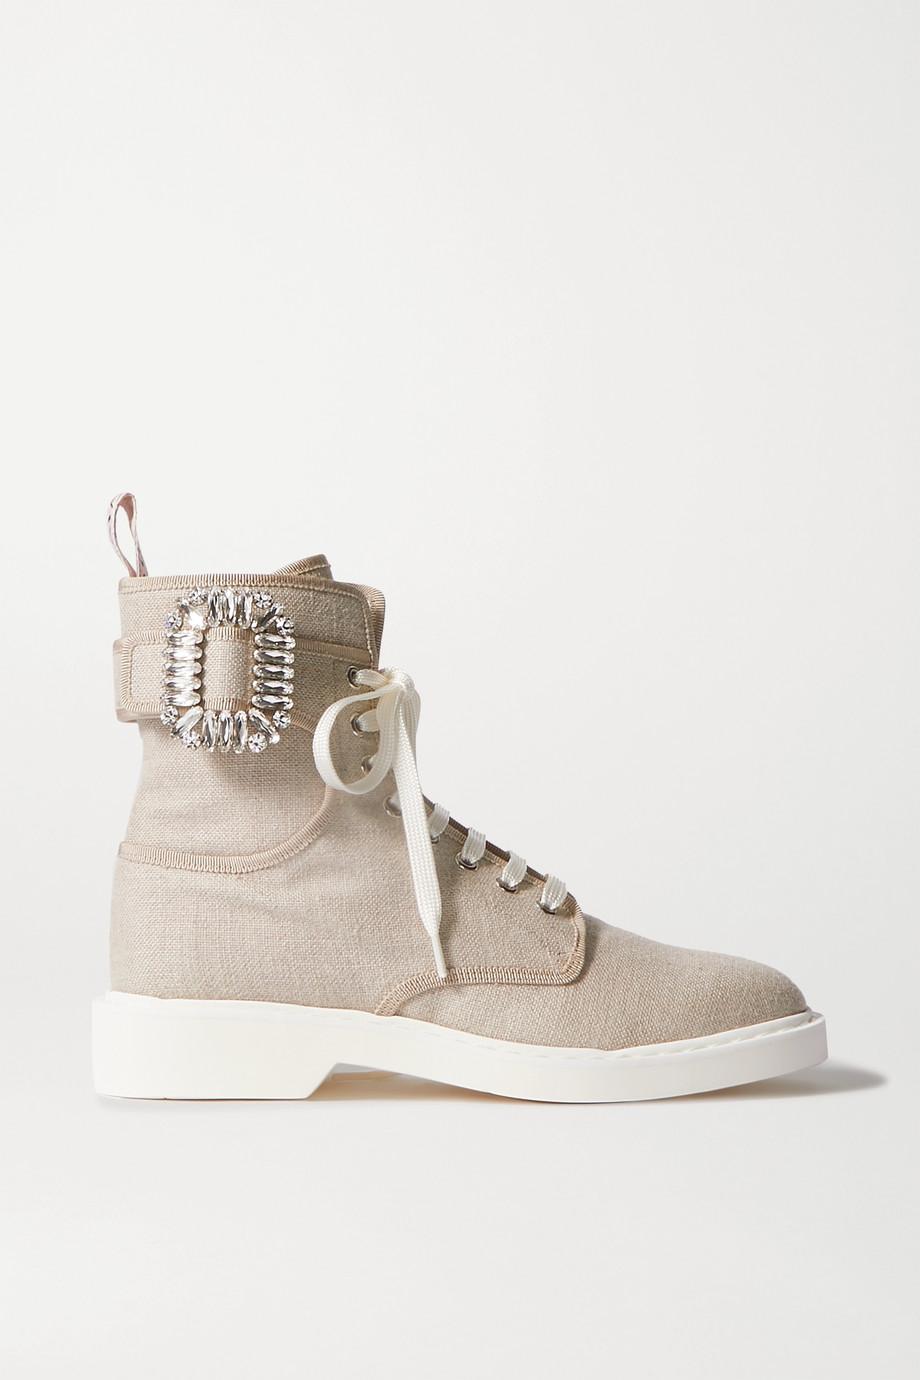 Roger Vivier Viv Ranger 水晶缀饰帆布踝靴